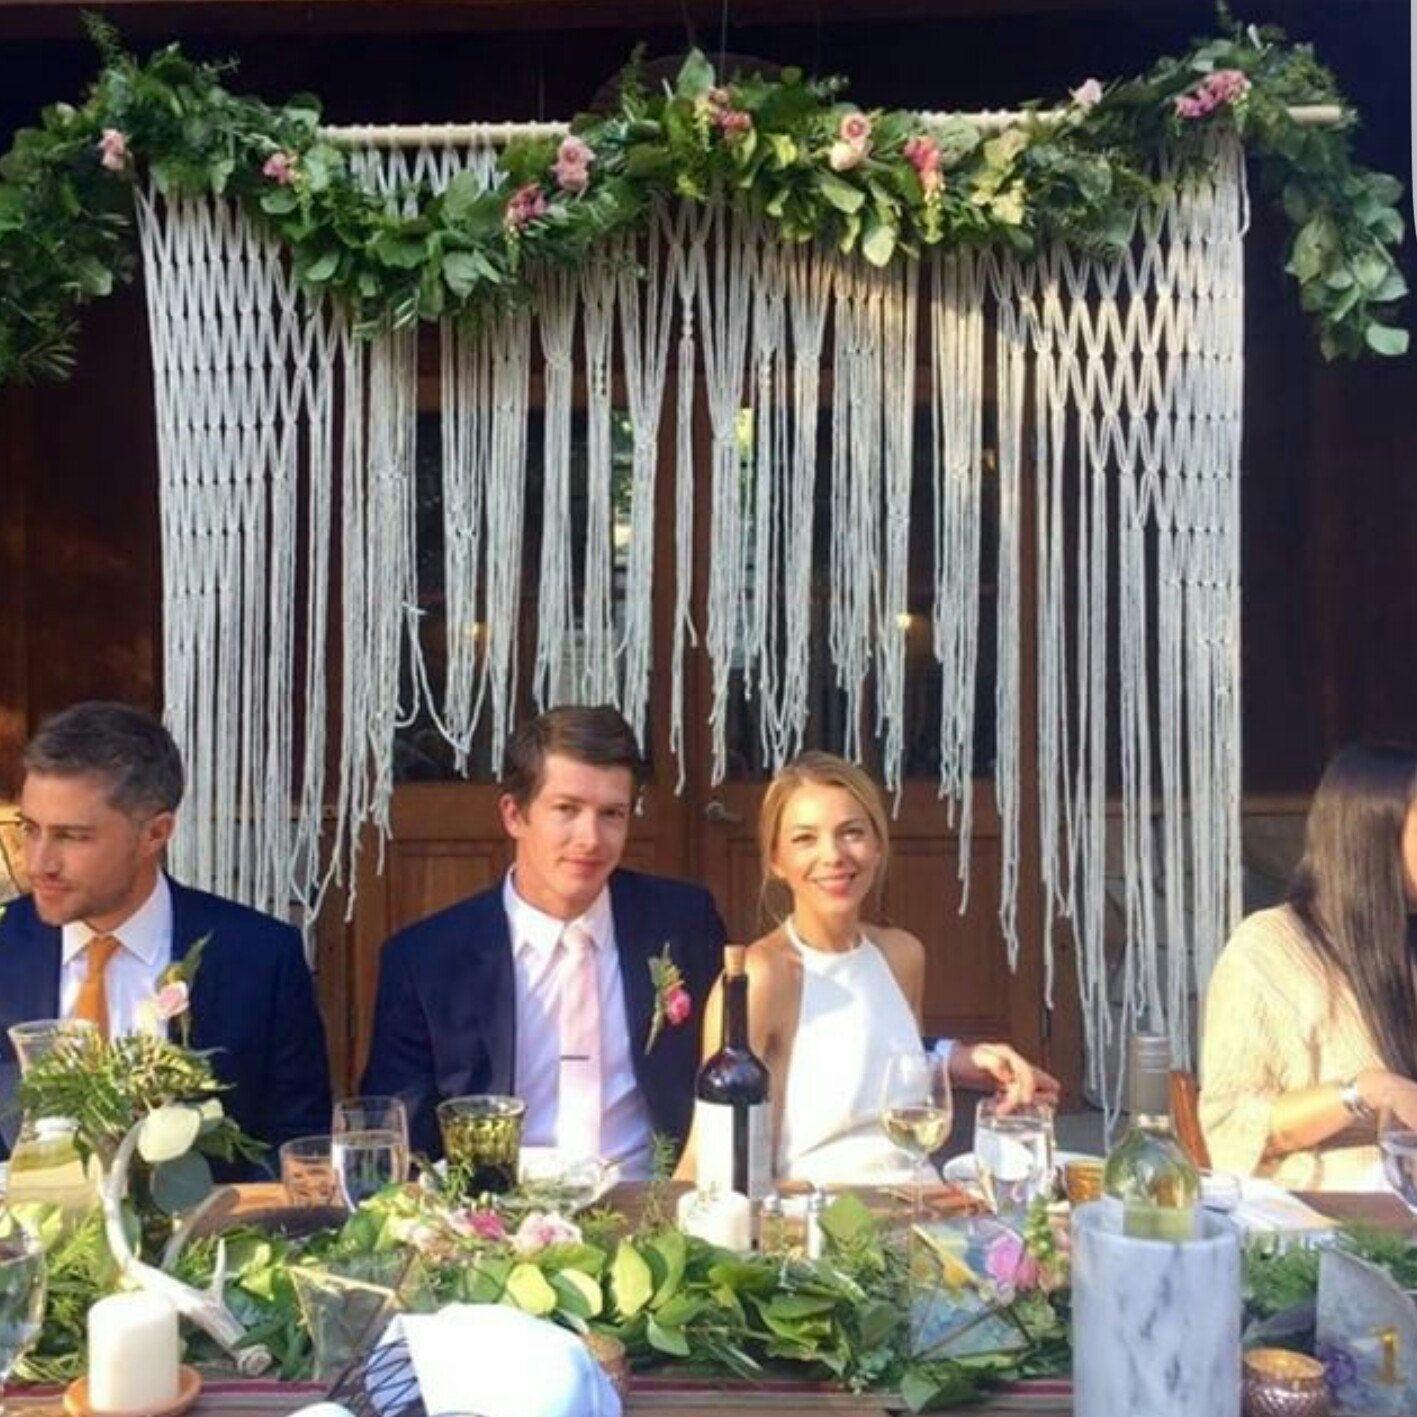 Altar Wedding Cars Timperley: Boho Wedding Hanging For Wedding Decor On Arbors And